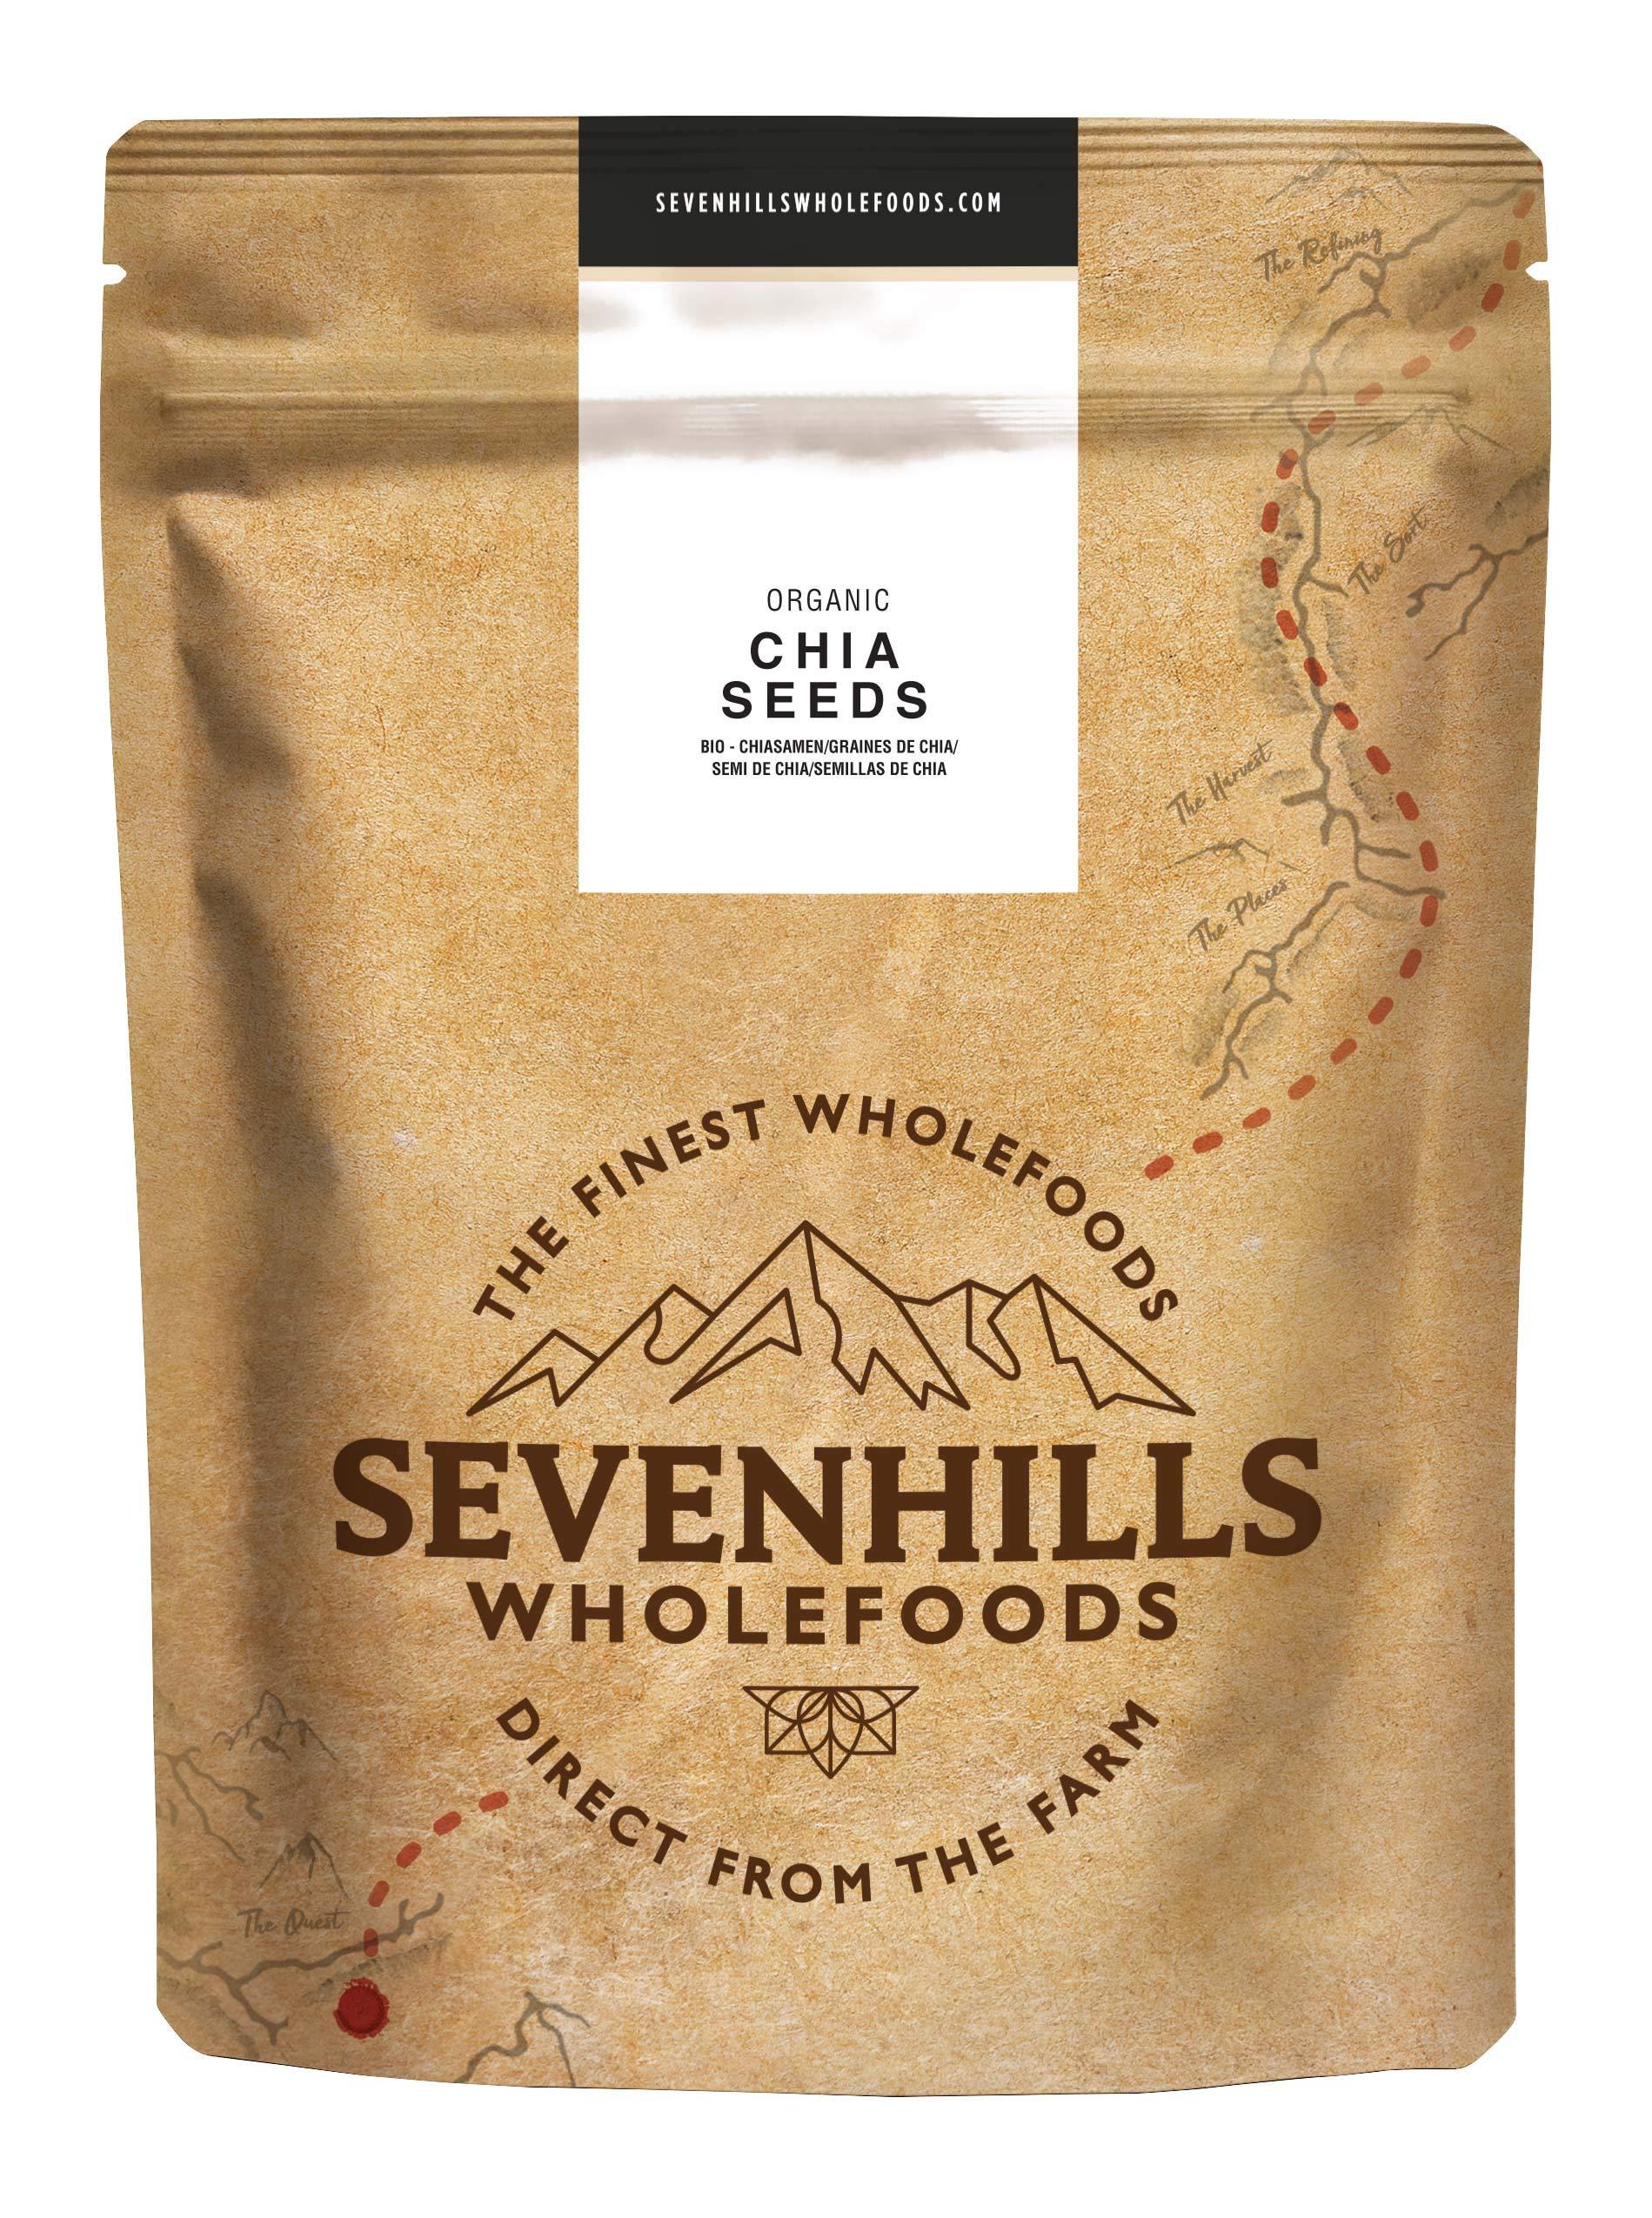 Sevenhills Wholefoods Roh Chiasamen Bio 2kg product image